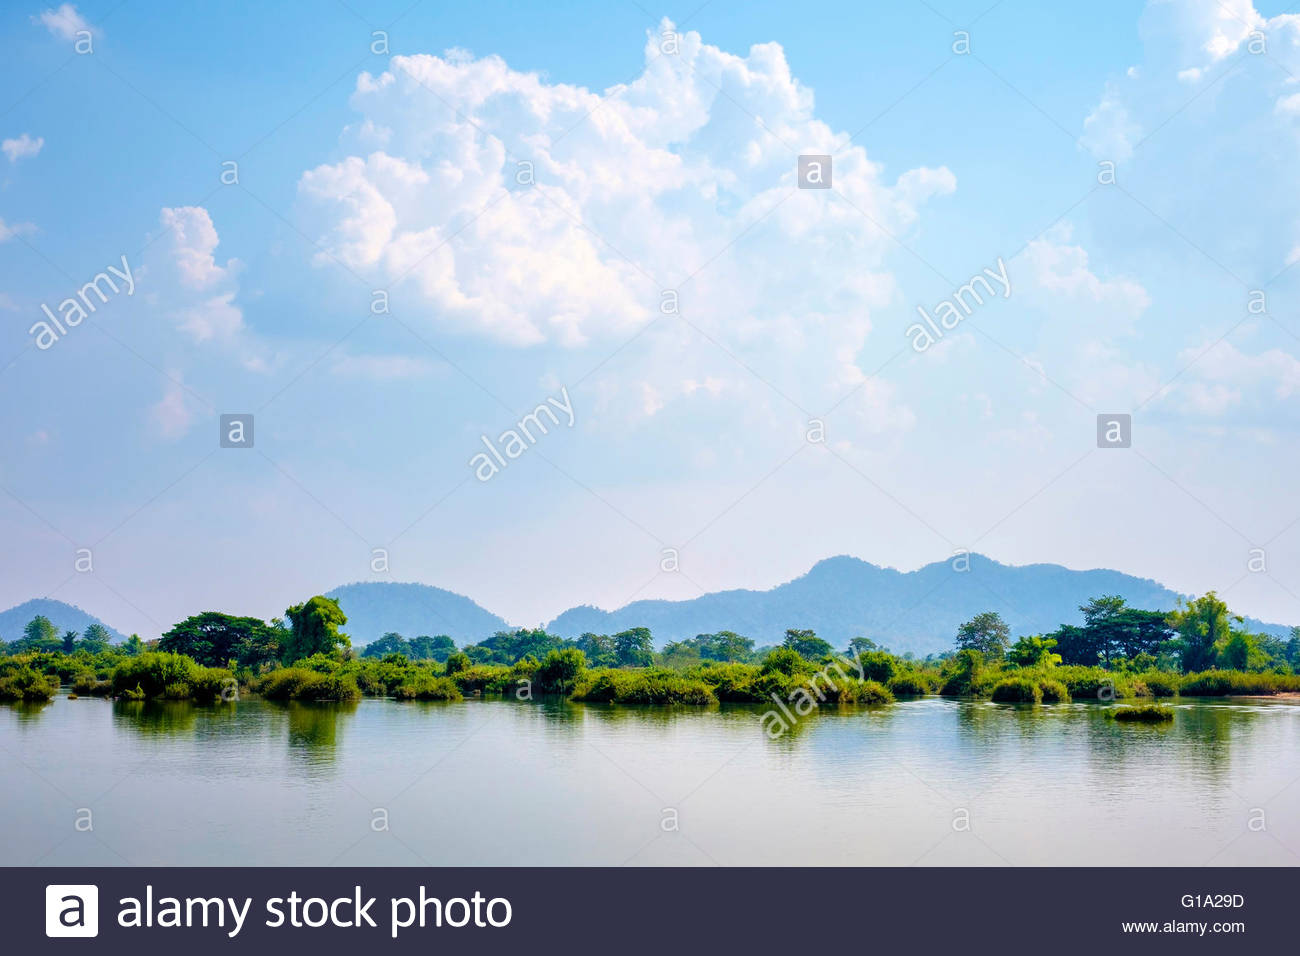 Mekong River at Don Det, Si Phan Don (Four Thousand Islands), Champasak Province, Laos - Stock Image